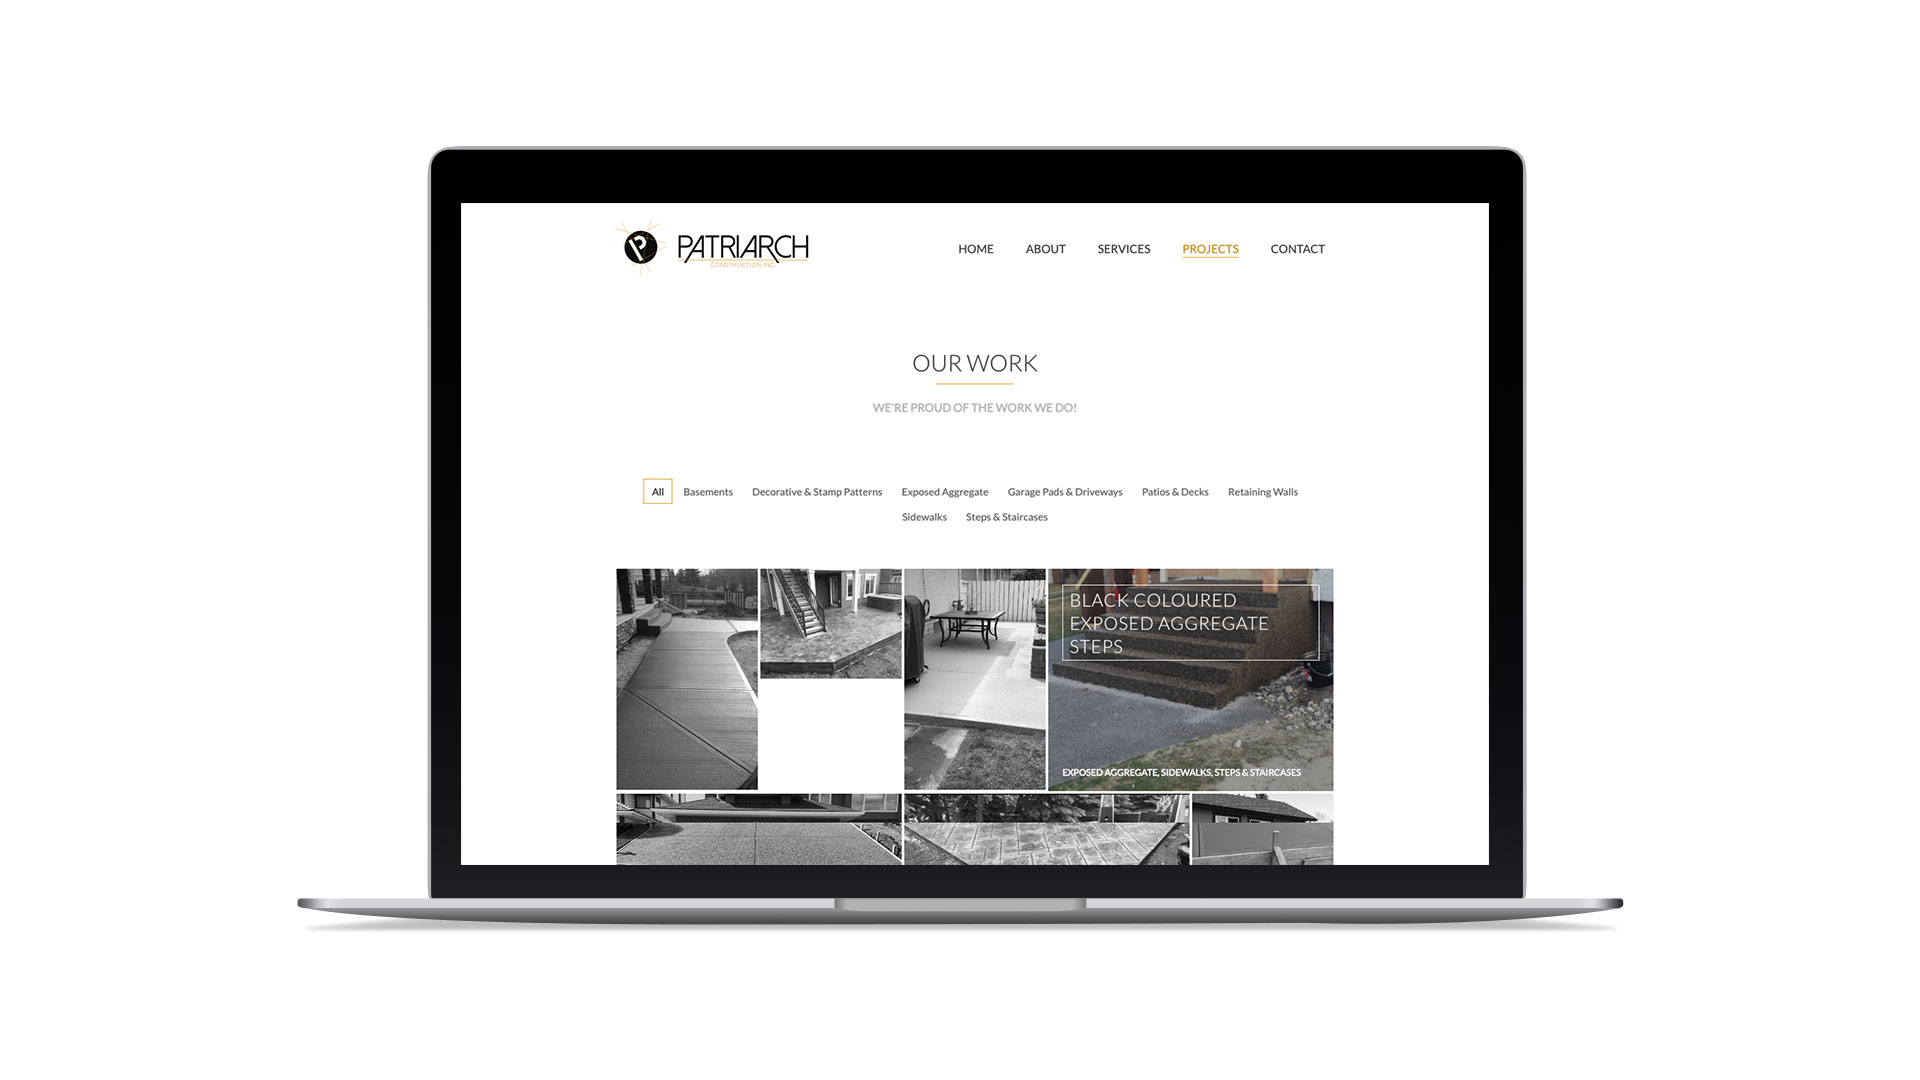 Website Design & Development for Patriarch Construction